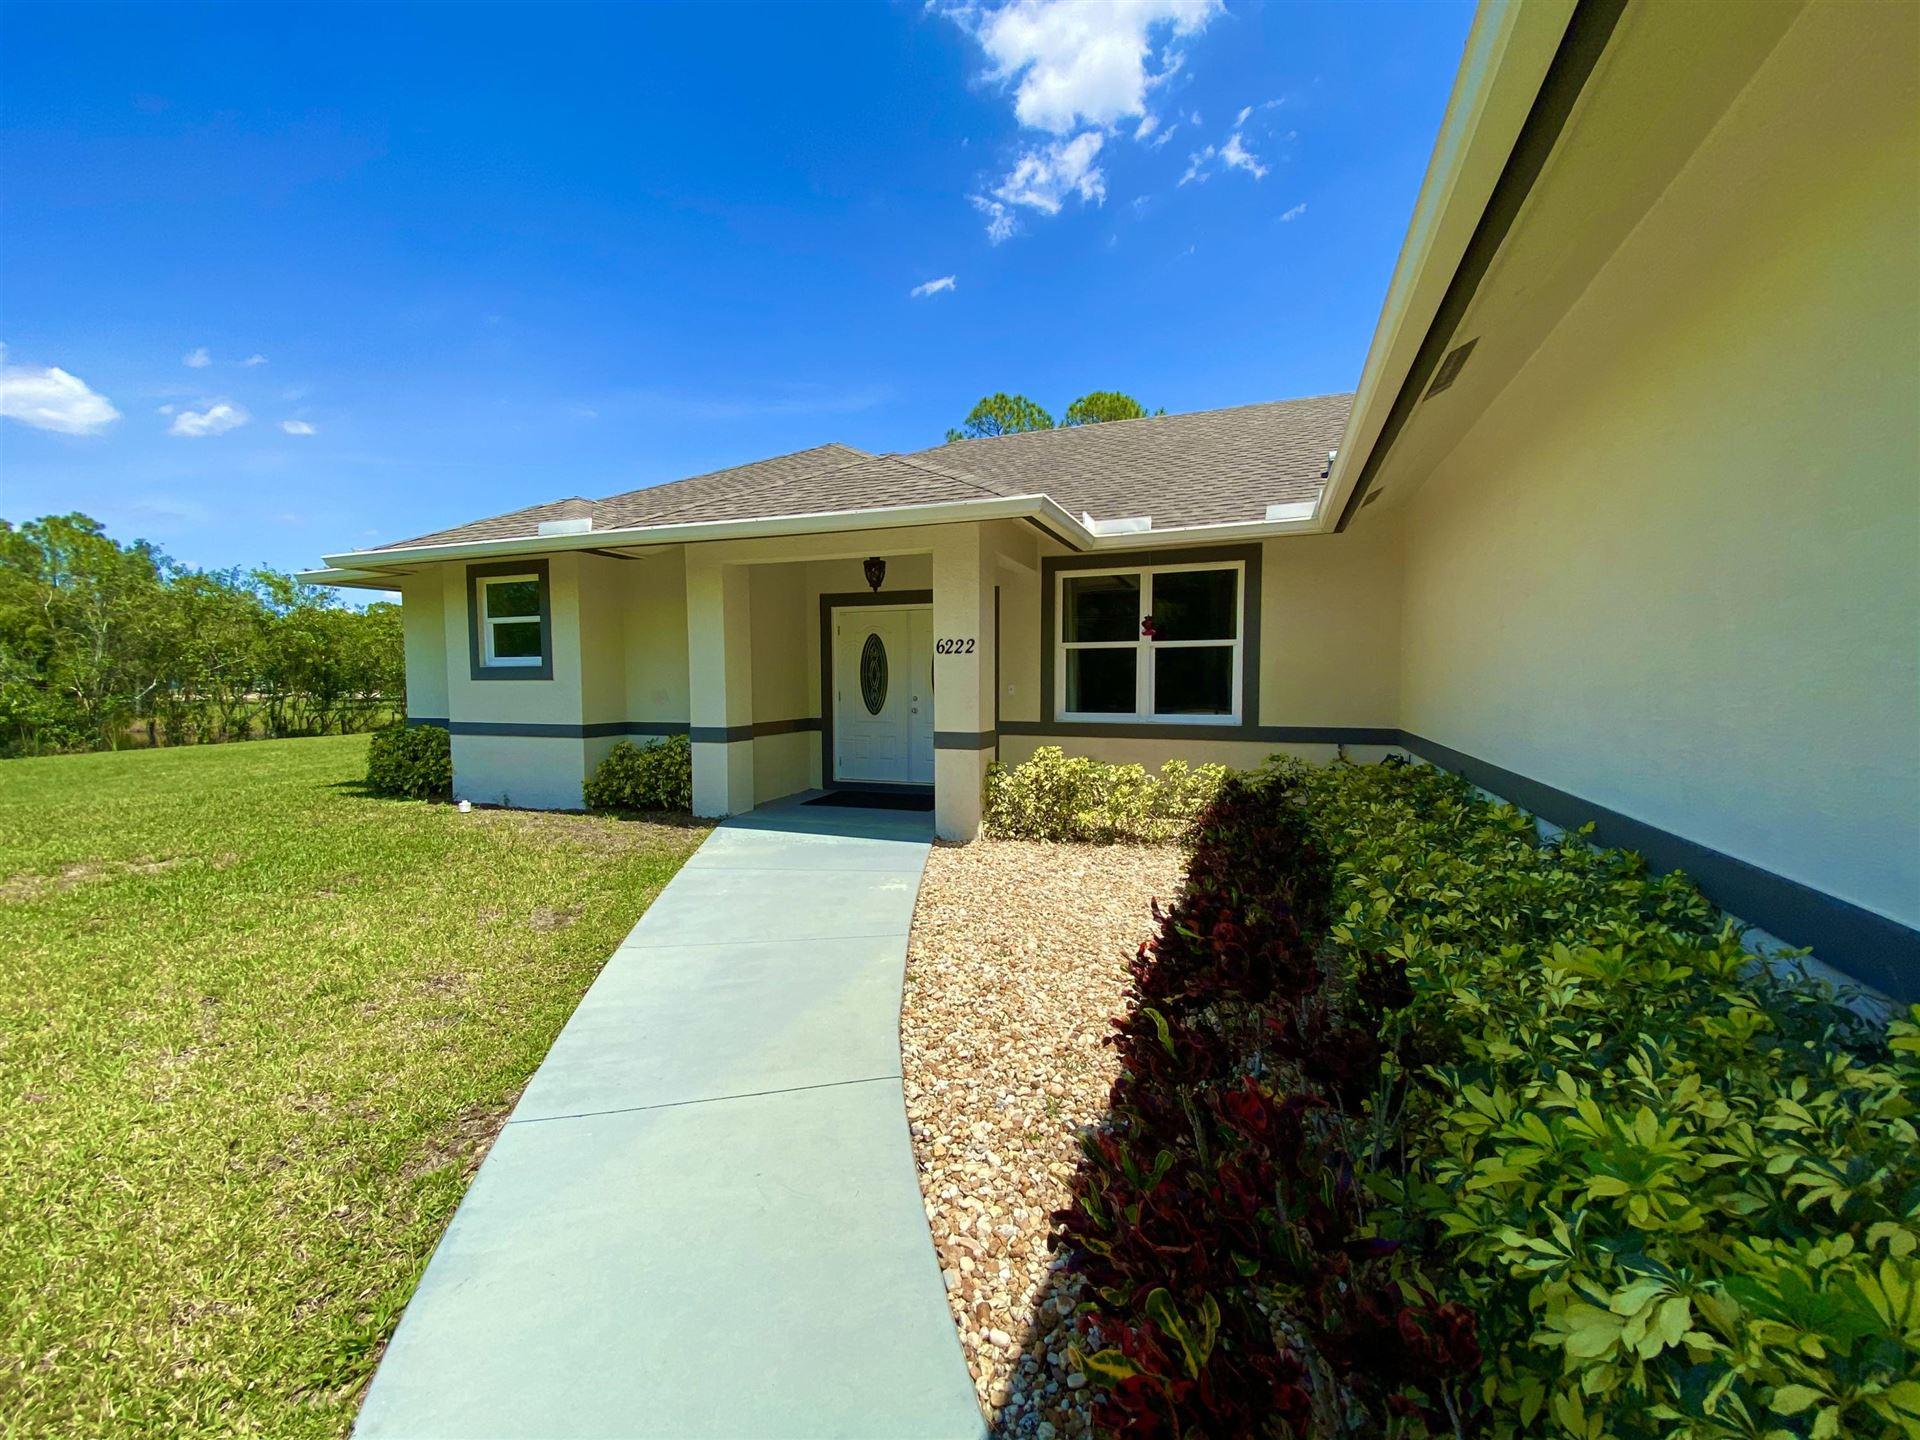 6222 Coconut Boulevard, West Palm Beach, FL 33470 - MLS#: RX-10708812